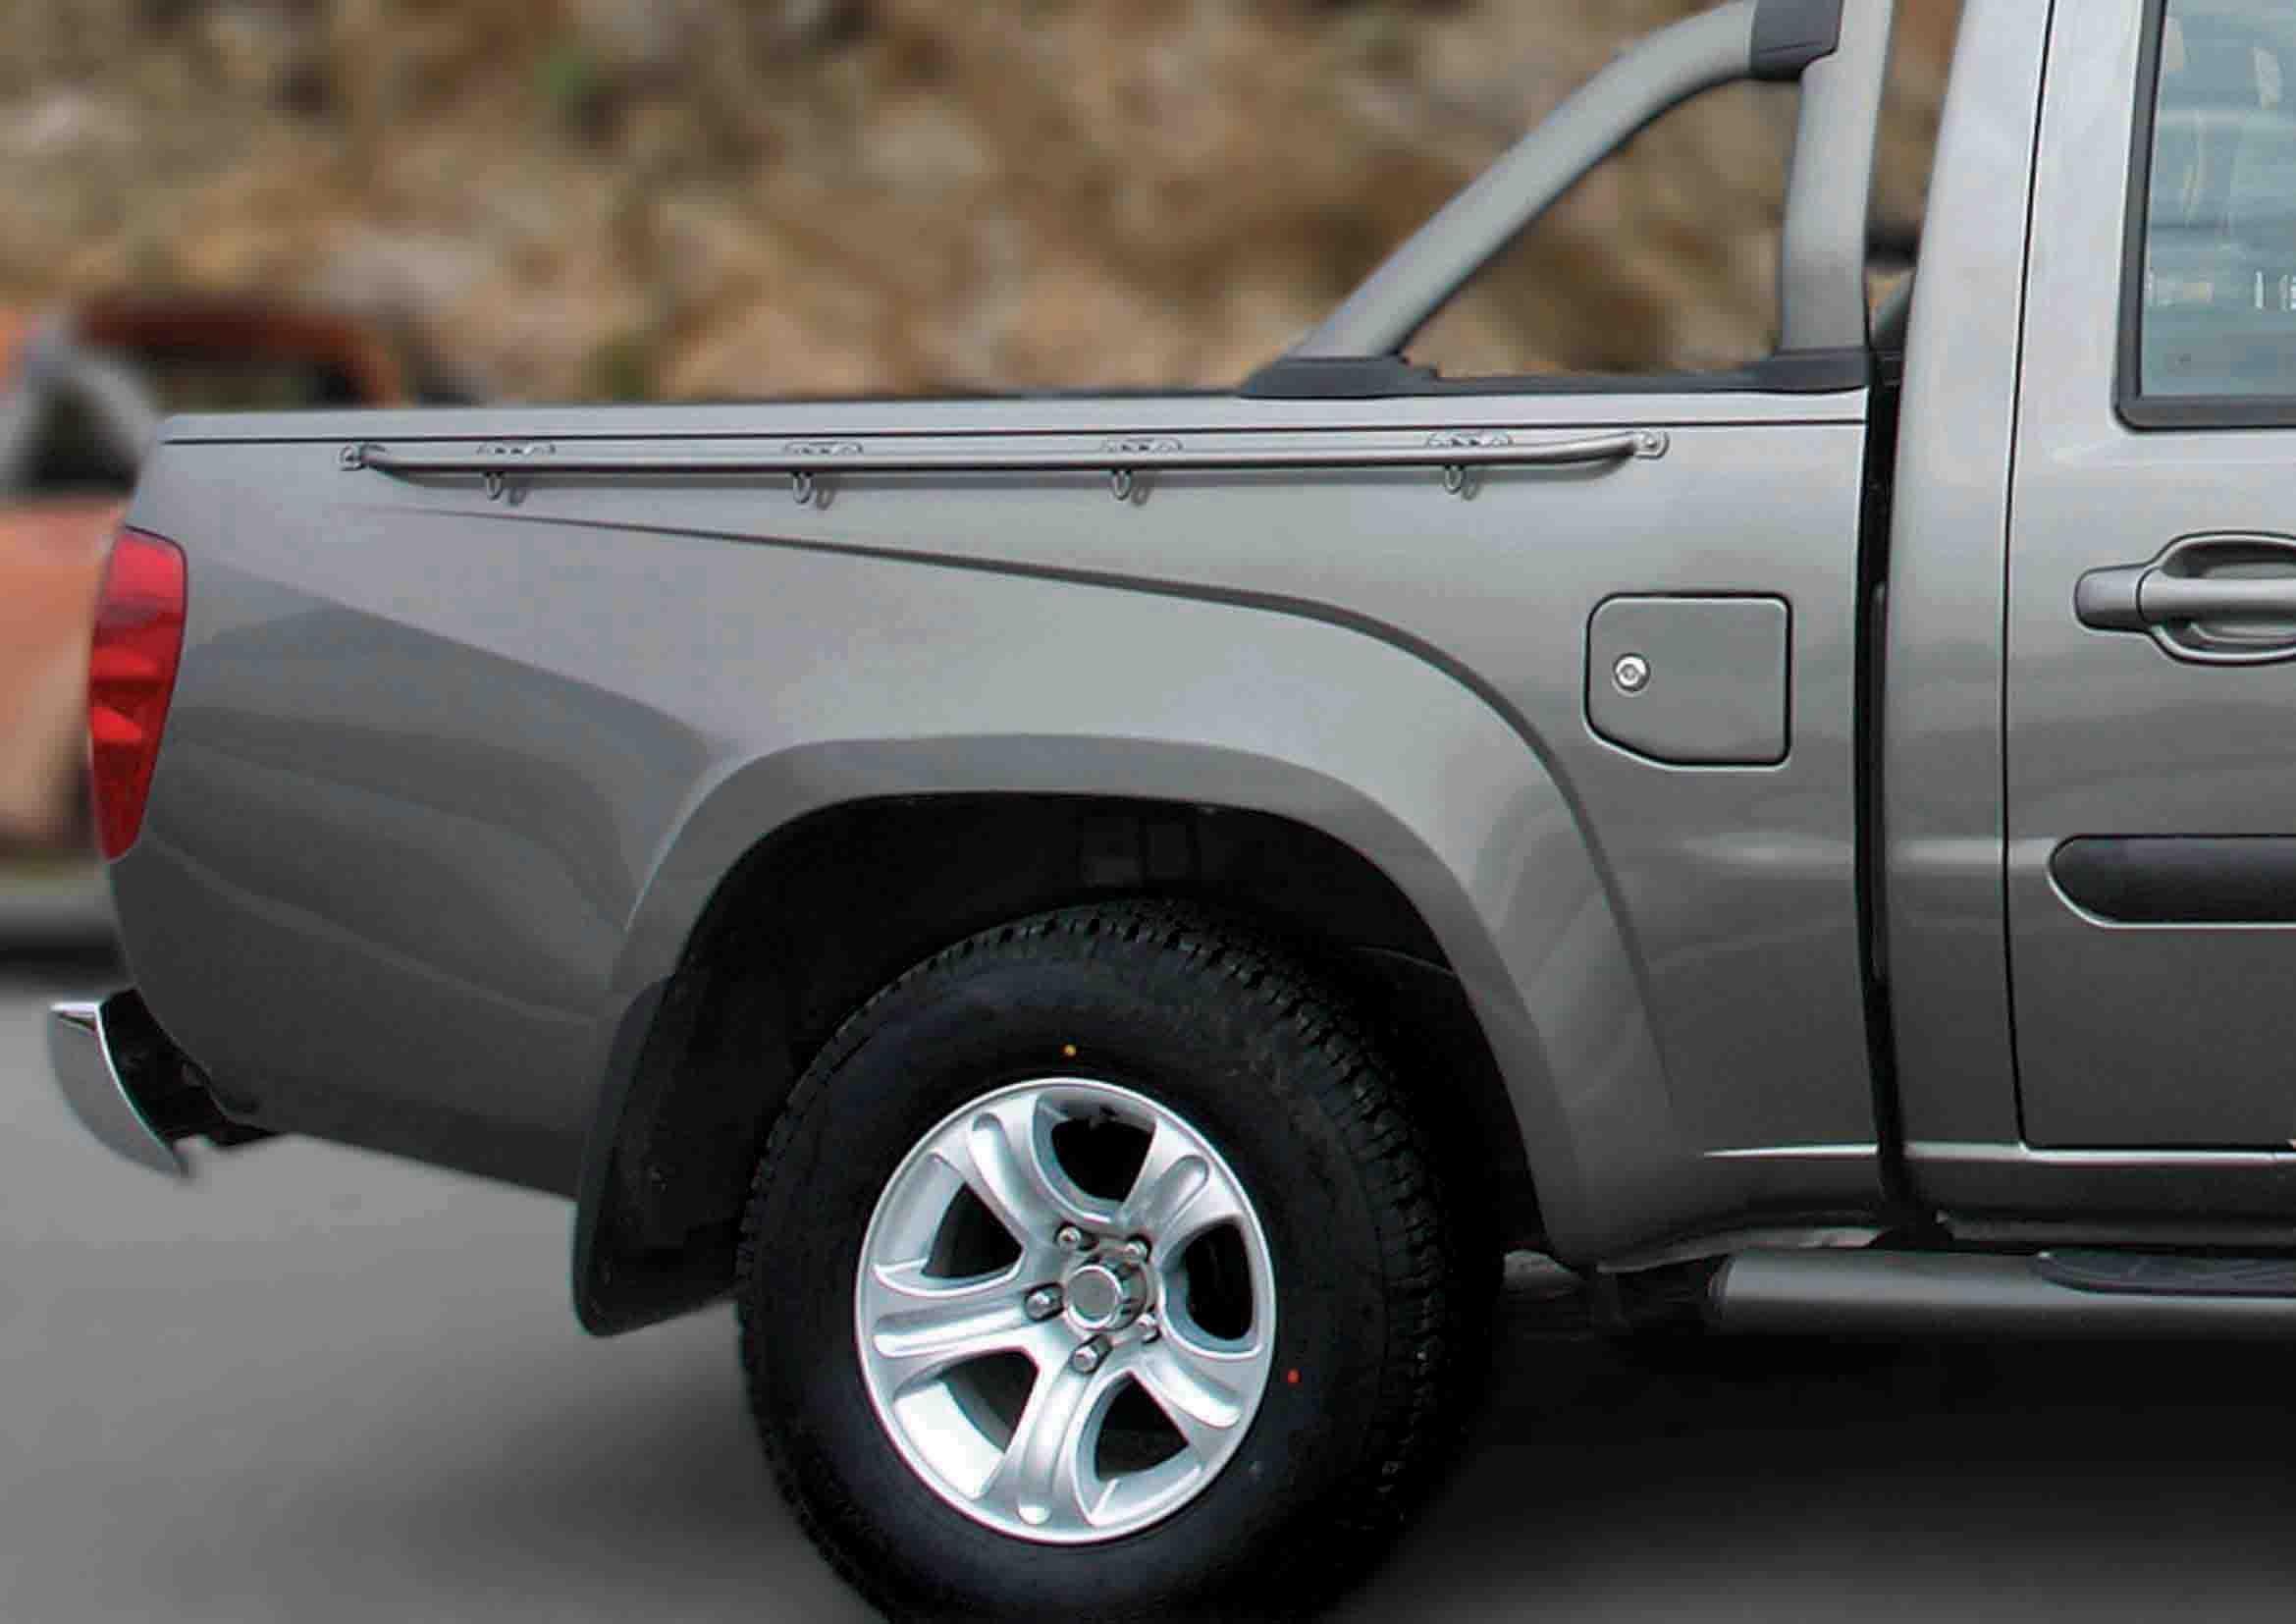 PLUTUS pickup truck